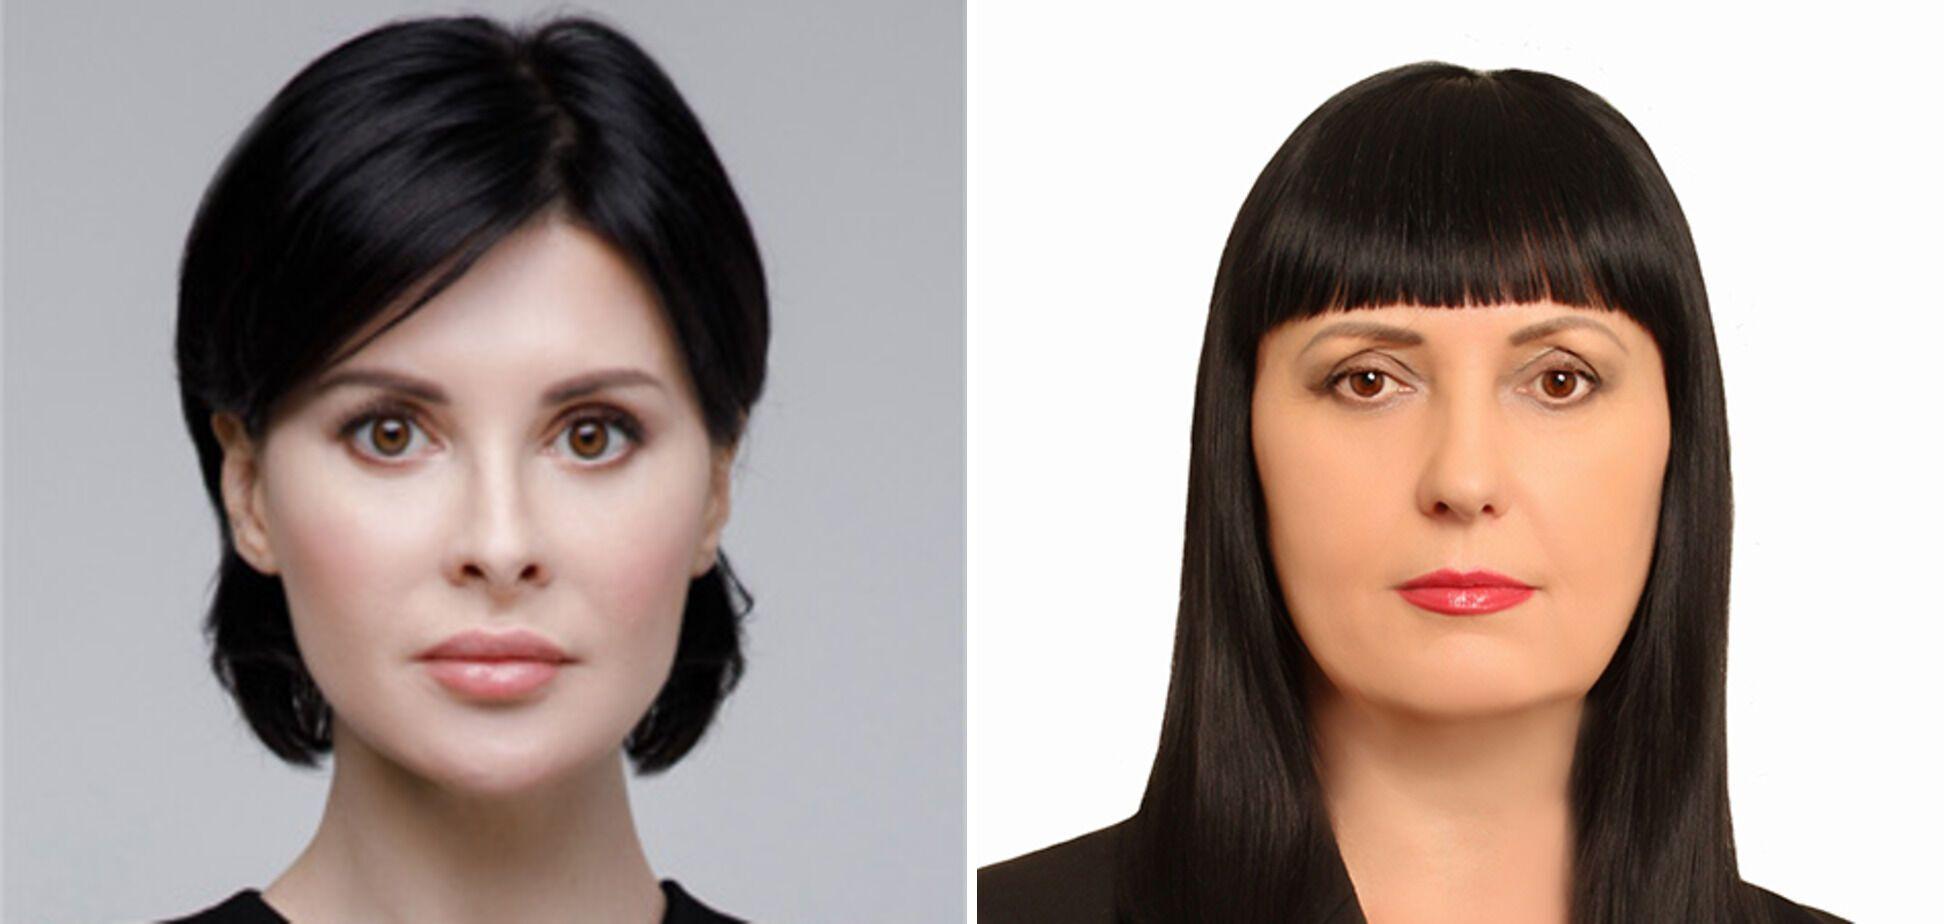 Заступниці Товмасяна Валерія Мураєва (зліва) і Тетяна Біловол (праворуч).